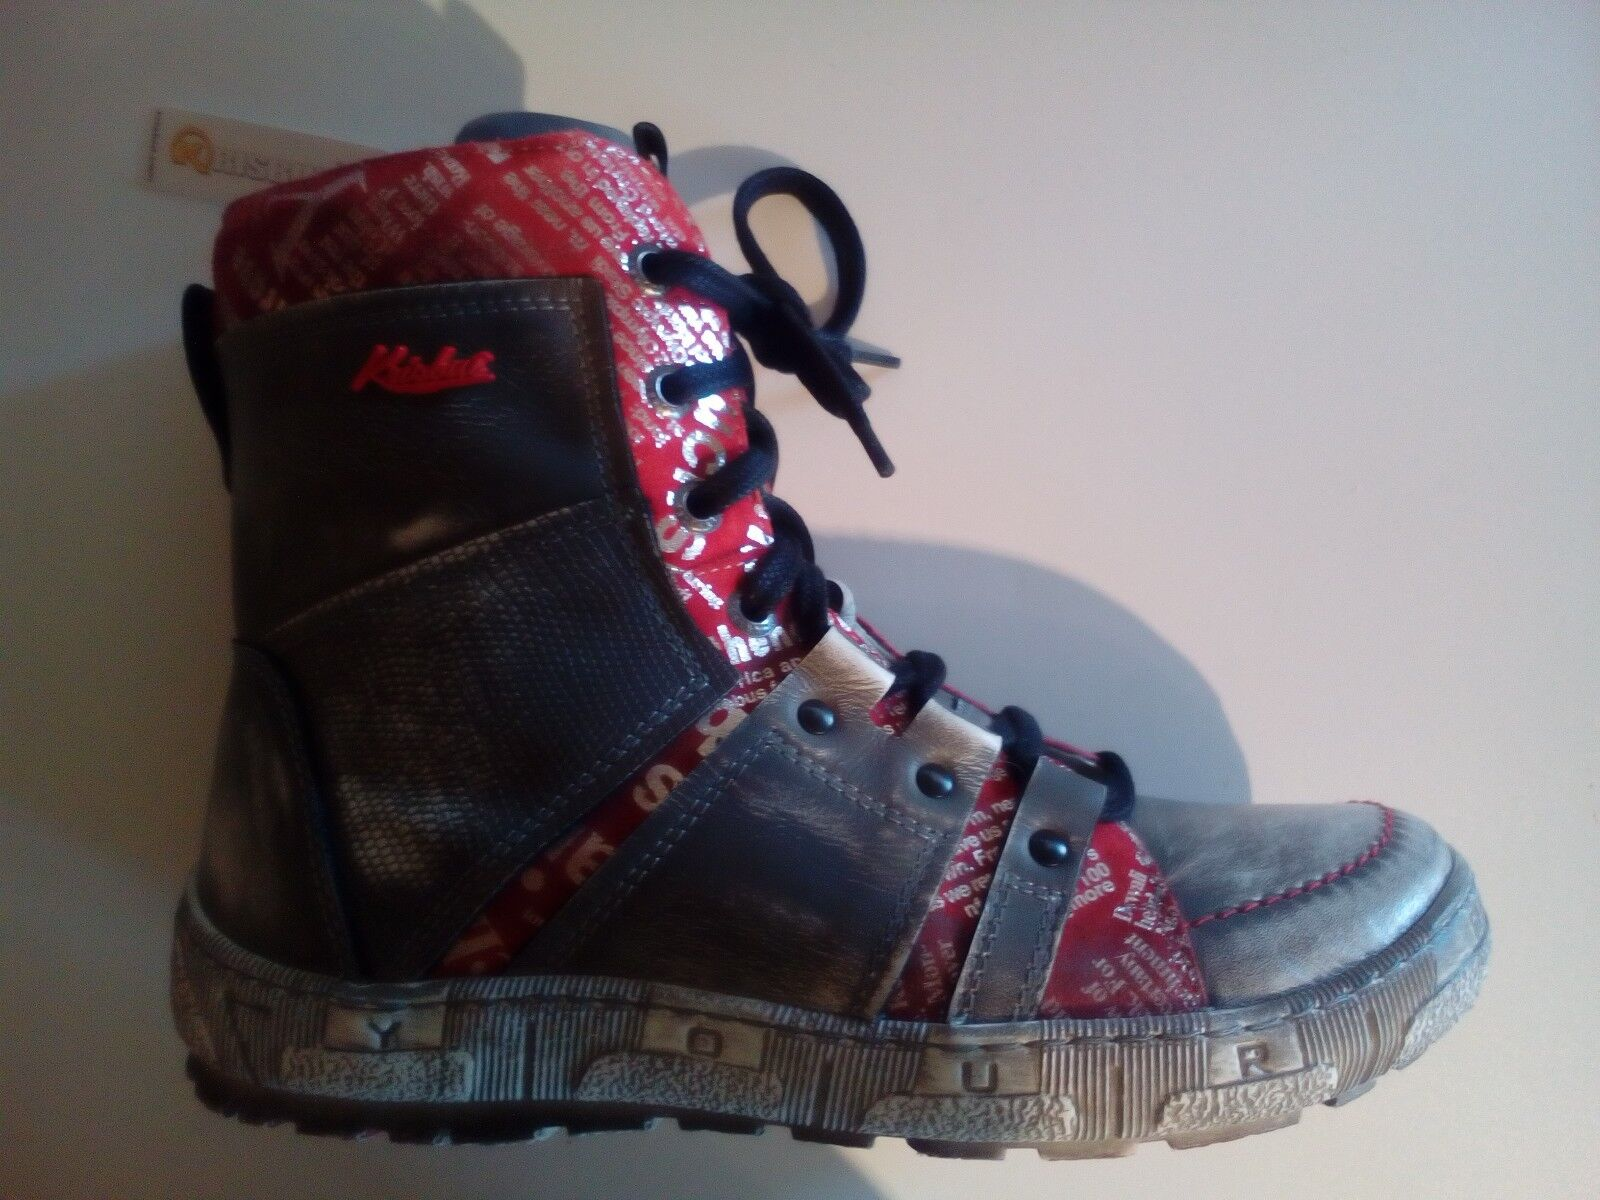 Krisbut Damen Leder Stiefel Reißverschluss Farbe grau-used-rot Größe 38-39-40 NEU